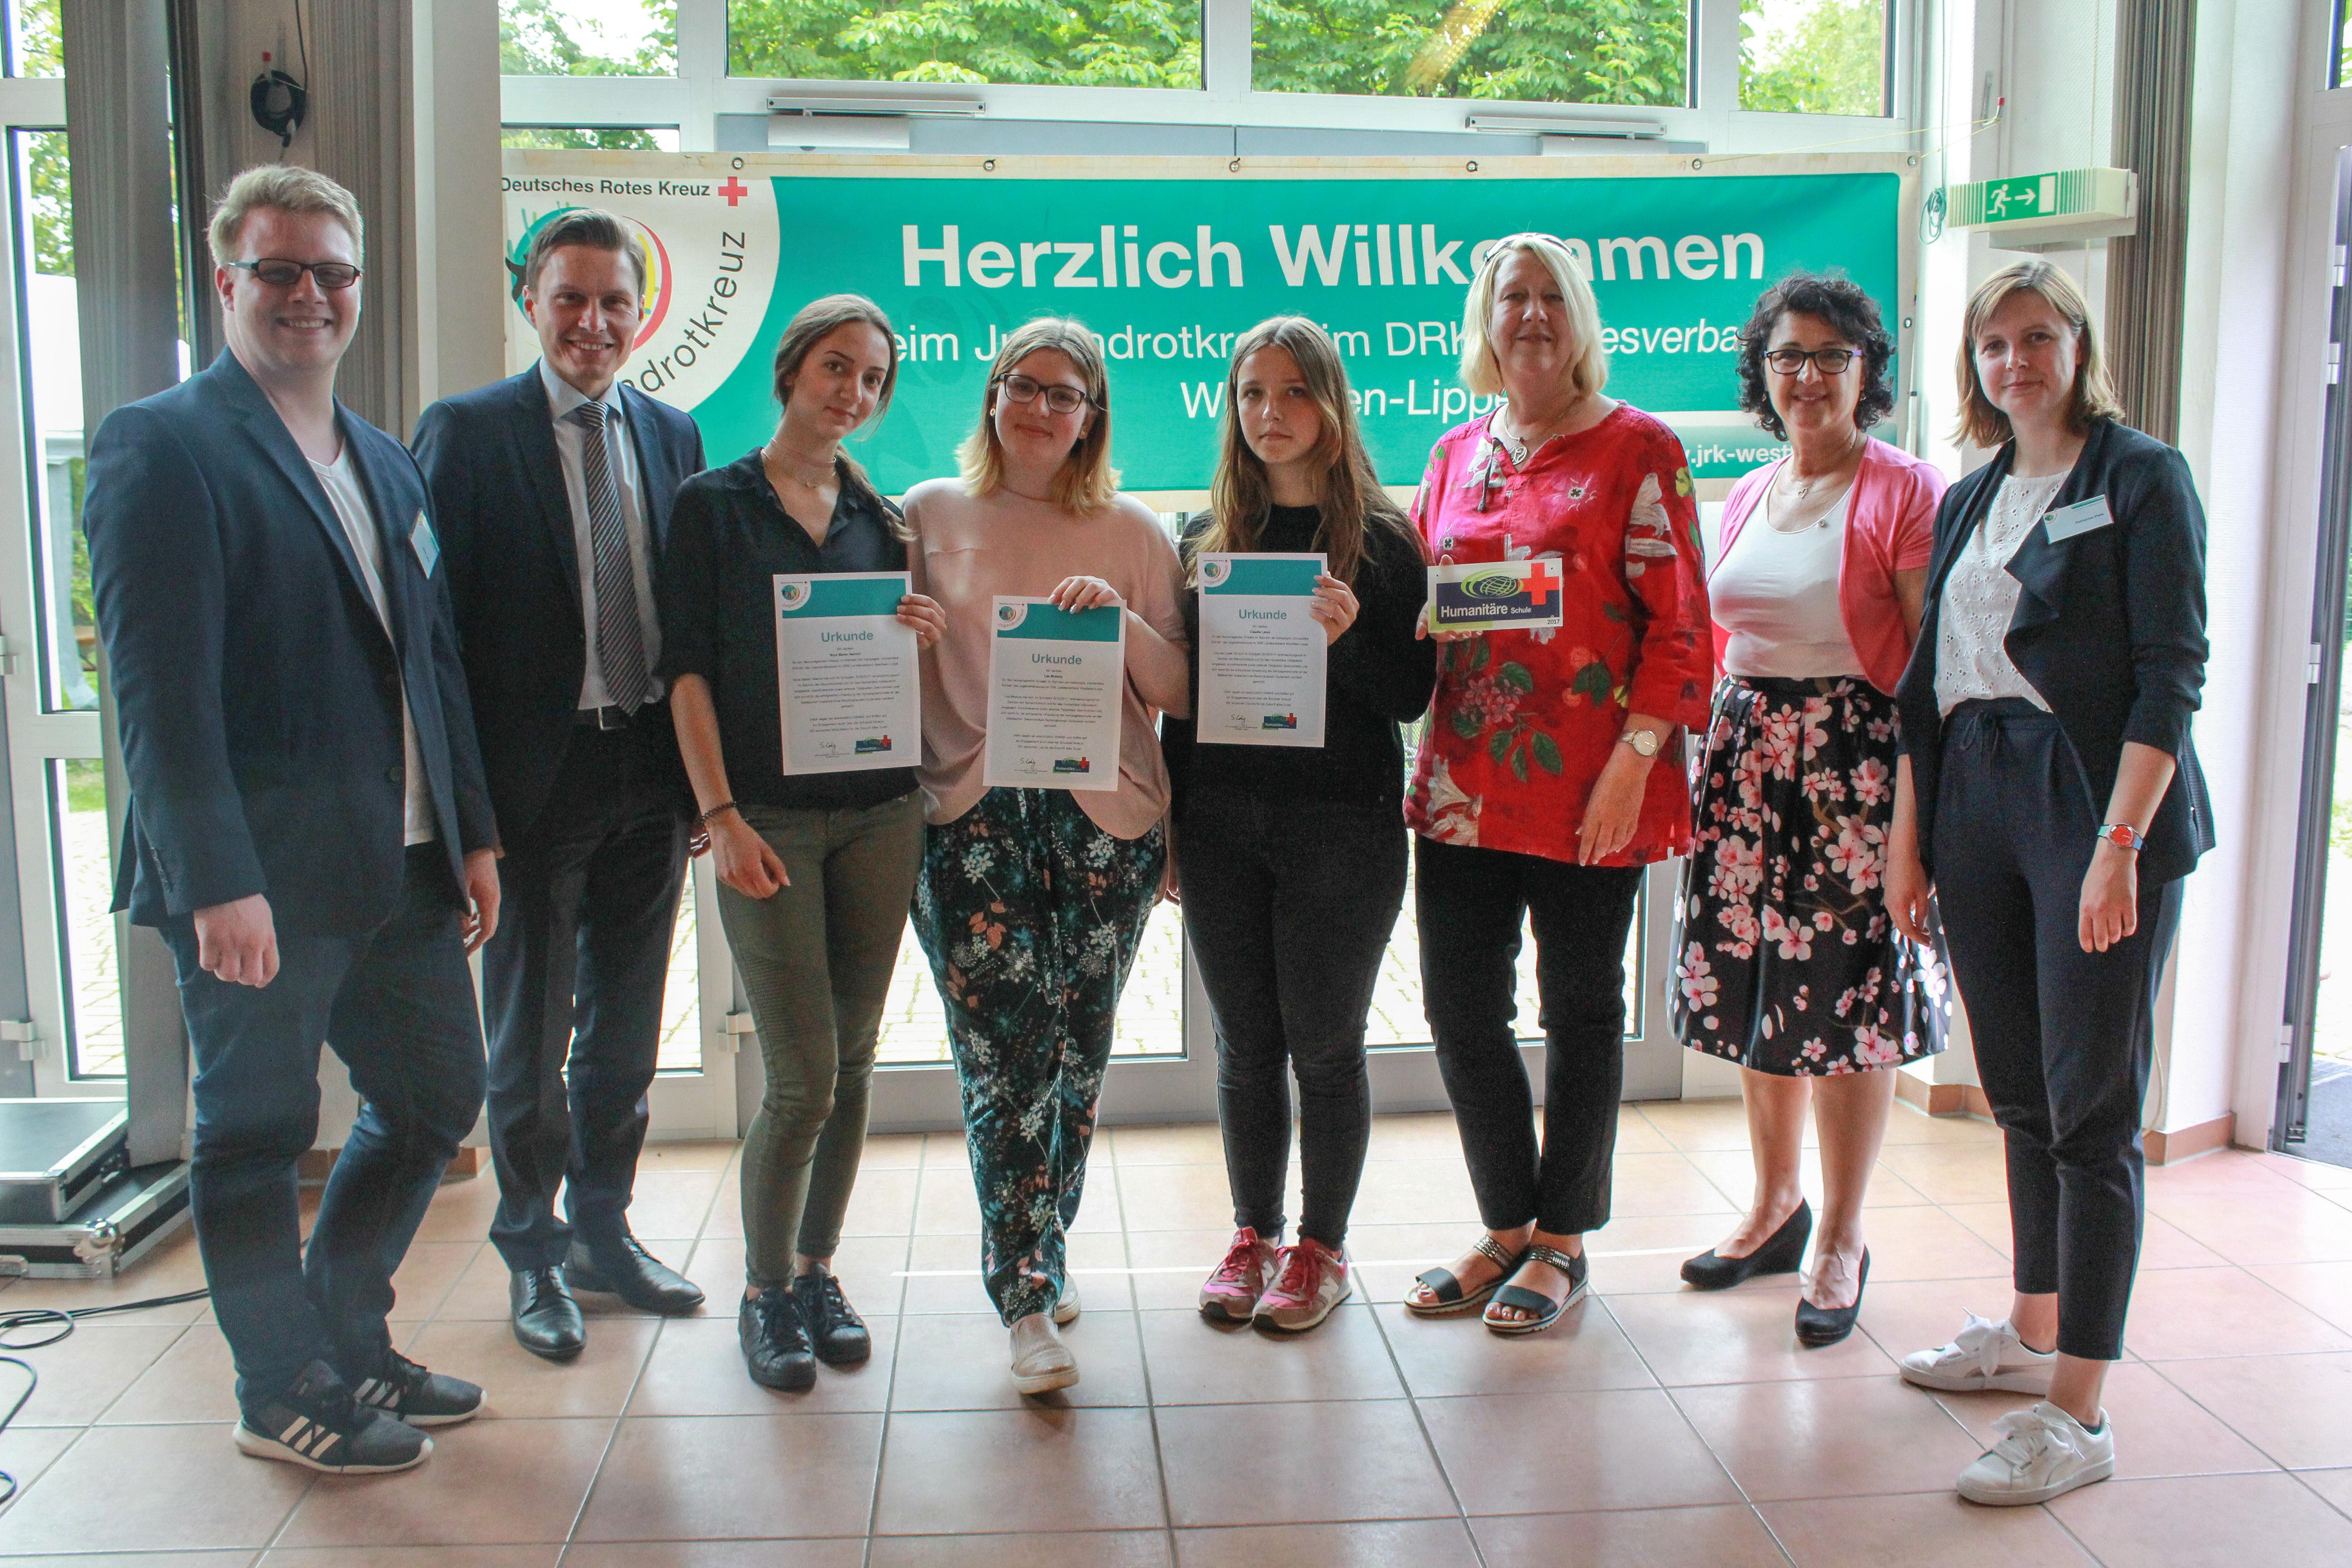 Preisverleihung in Gelsenkirchen